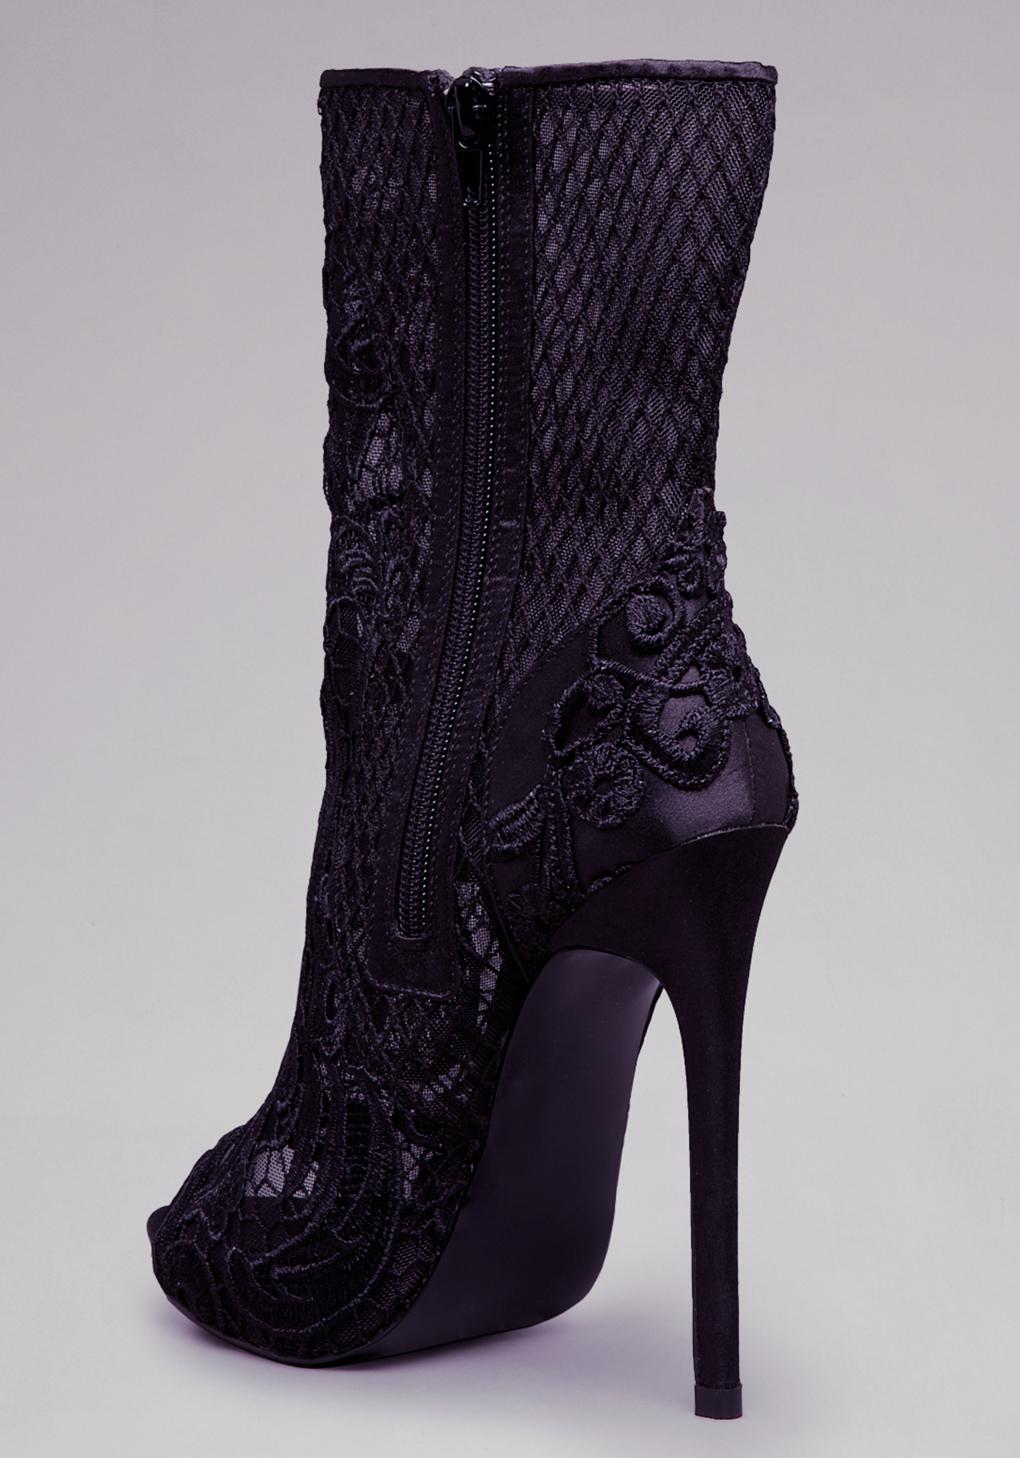 Bebe Evelina Lace Peep Toe Bootie in Black